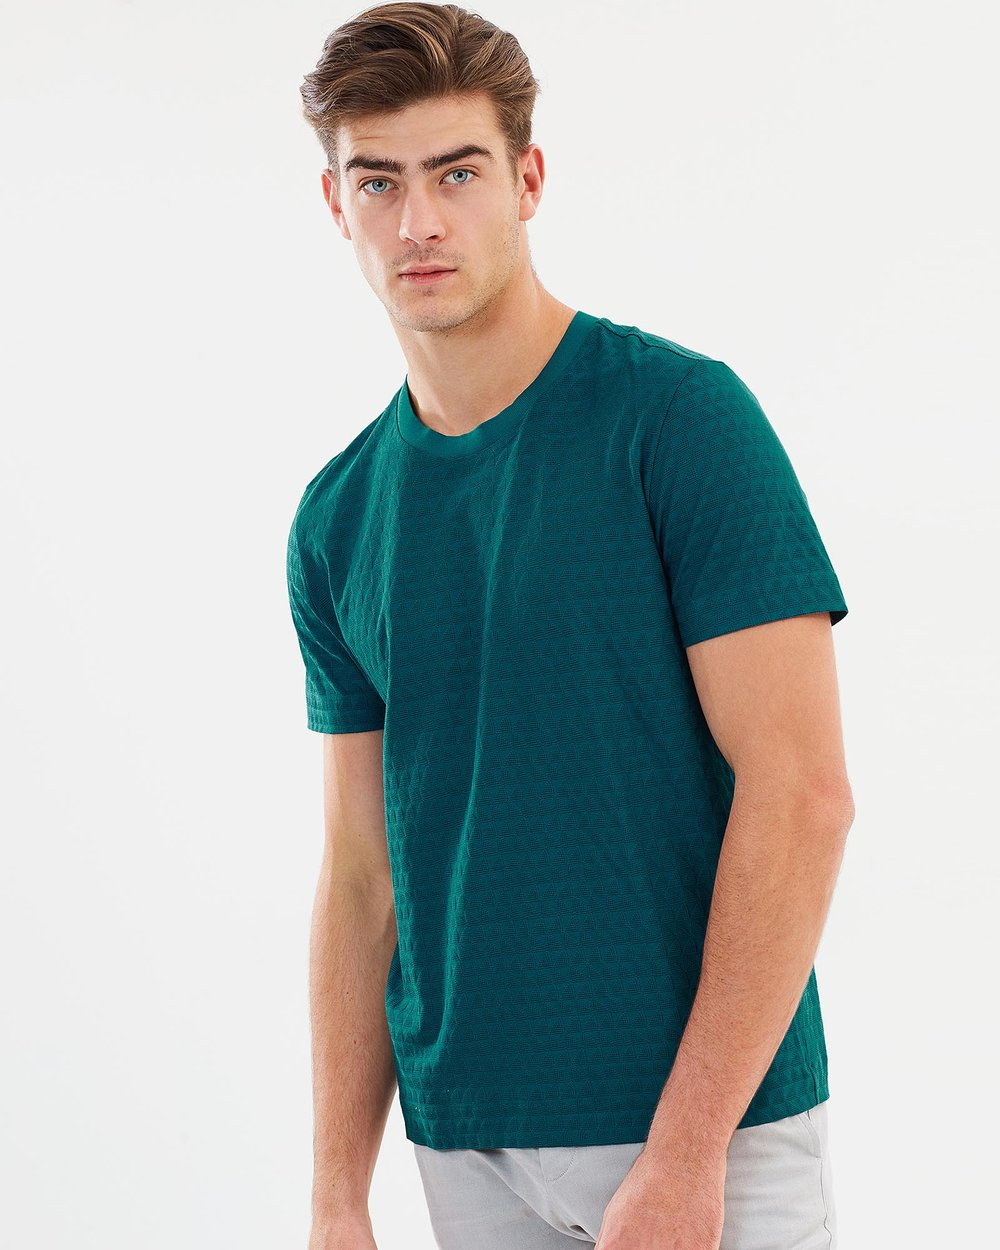 Sharktooth Check Cotton Silk T-Shirt by CERRUTI 1881 Online  0aebfeb80d